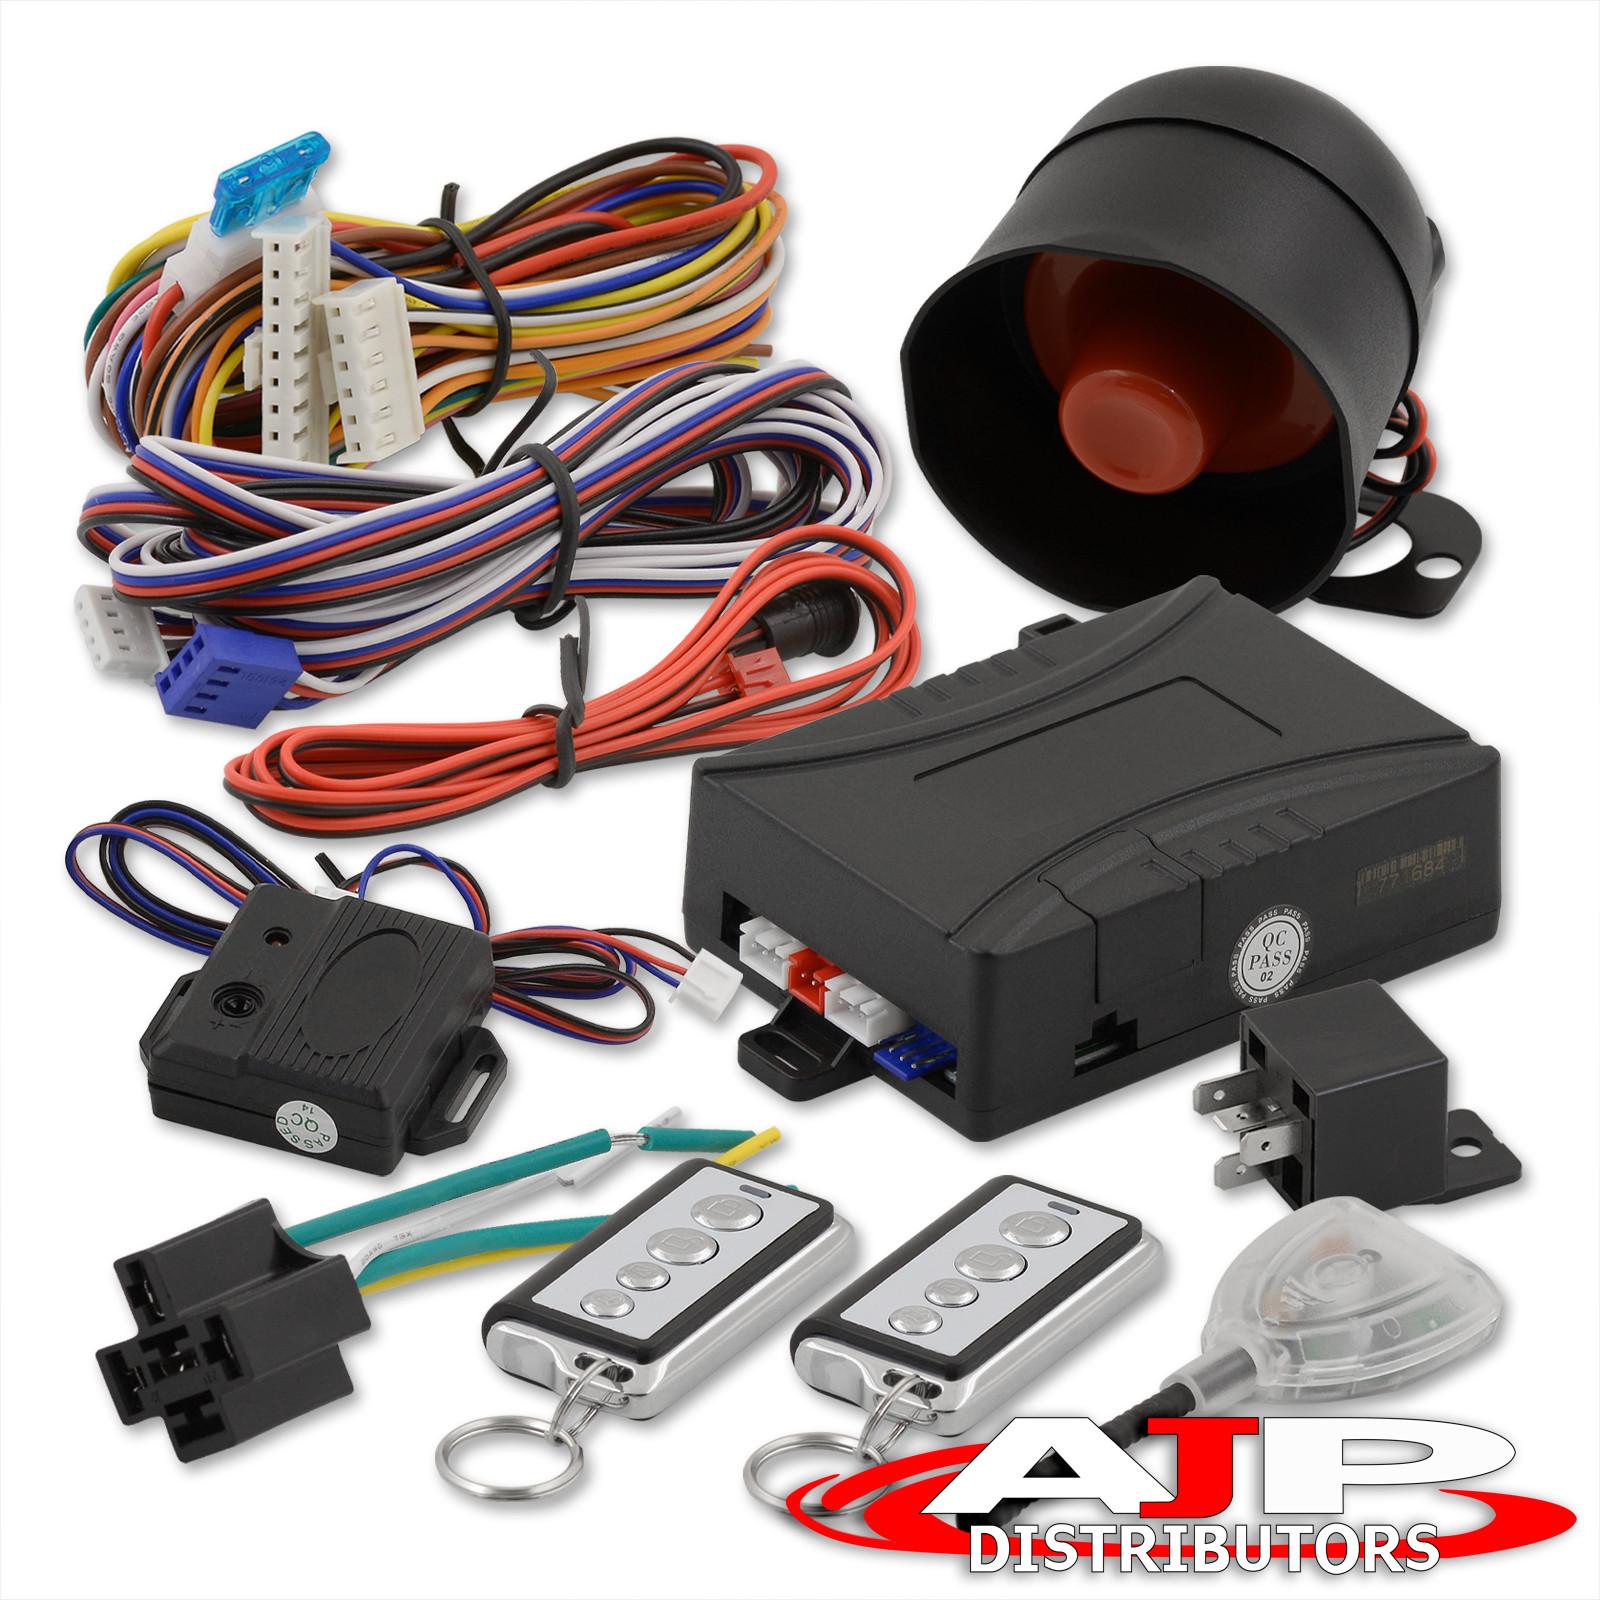 Jdm Remote Engine Start Car Alarm Security System W   Wiring 3 6 Rx8 Mazdaspeed